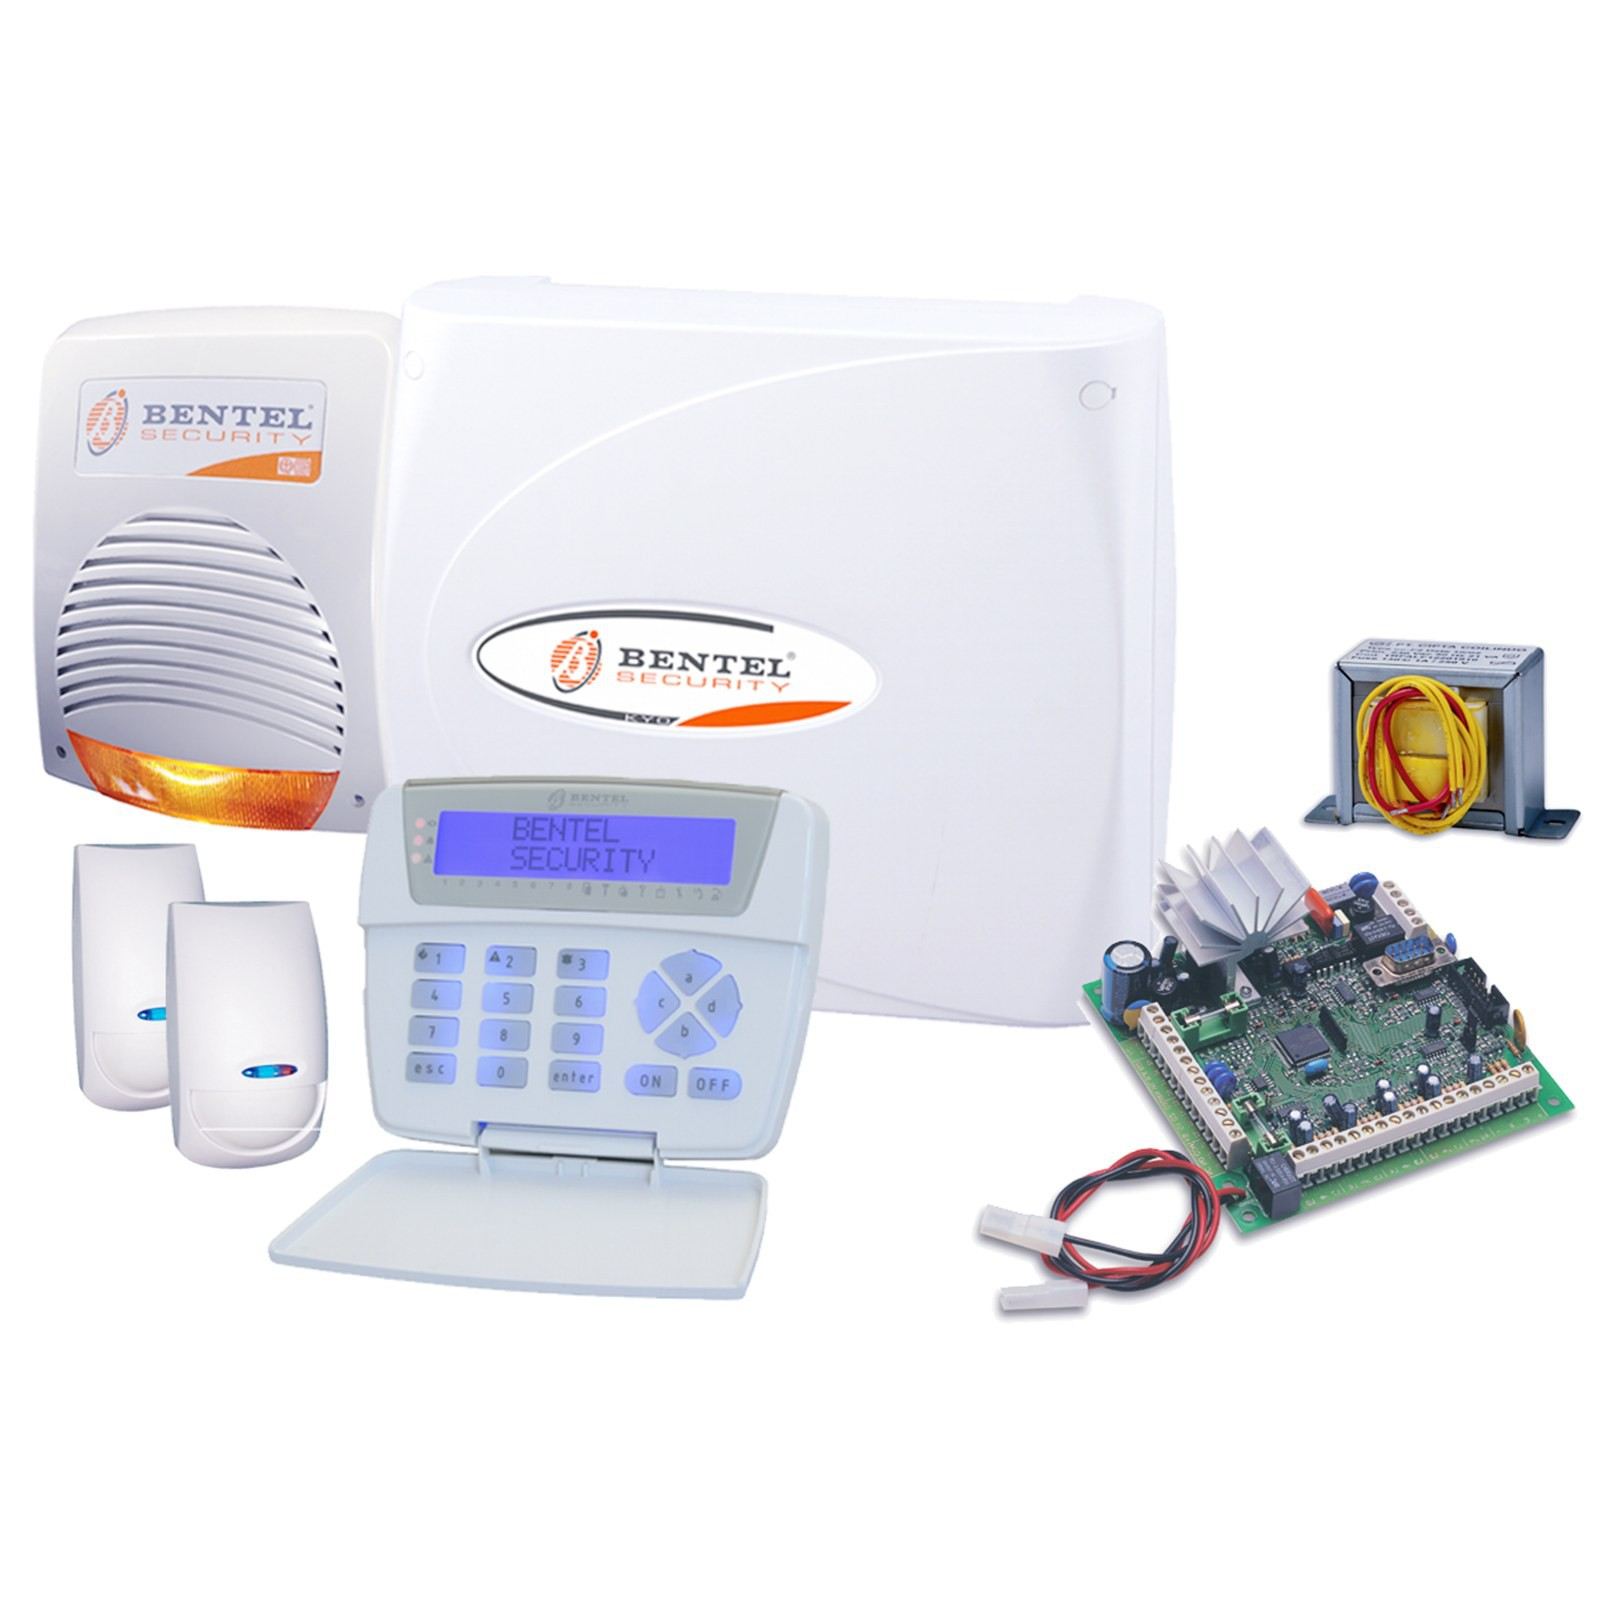 Kit Allarme Antifurto BENTEL Casa Centrale KYO8 Impianto Cablato Sirena Sensori - Area Illumina